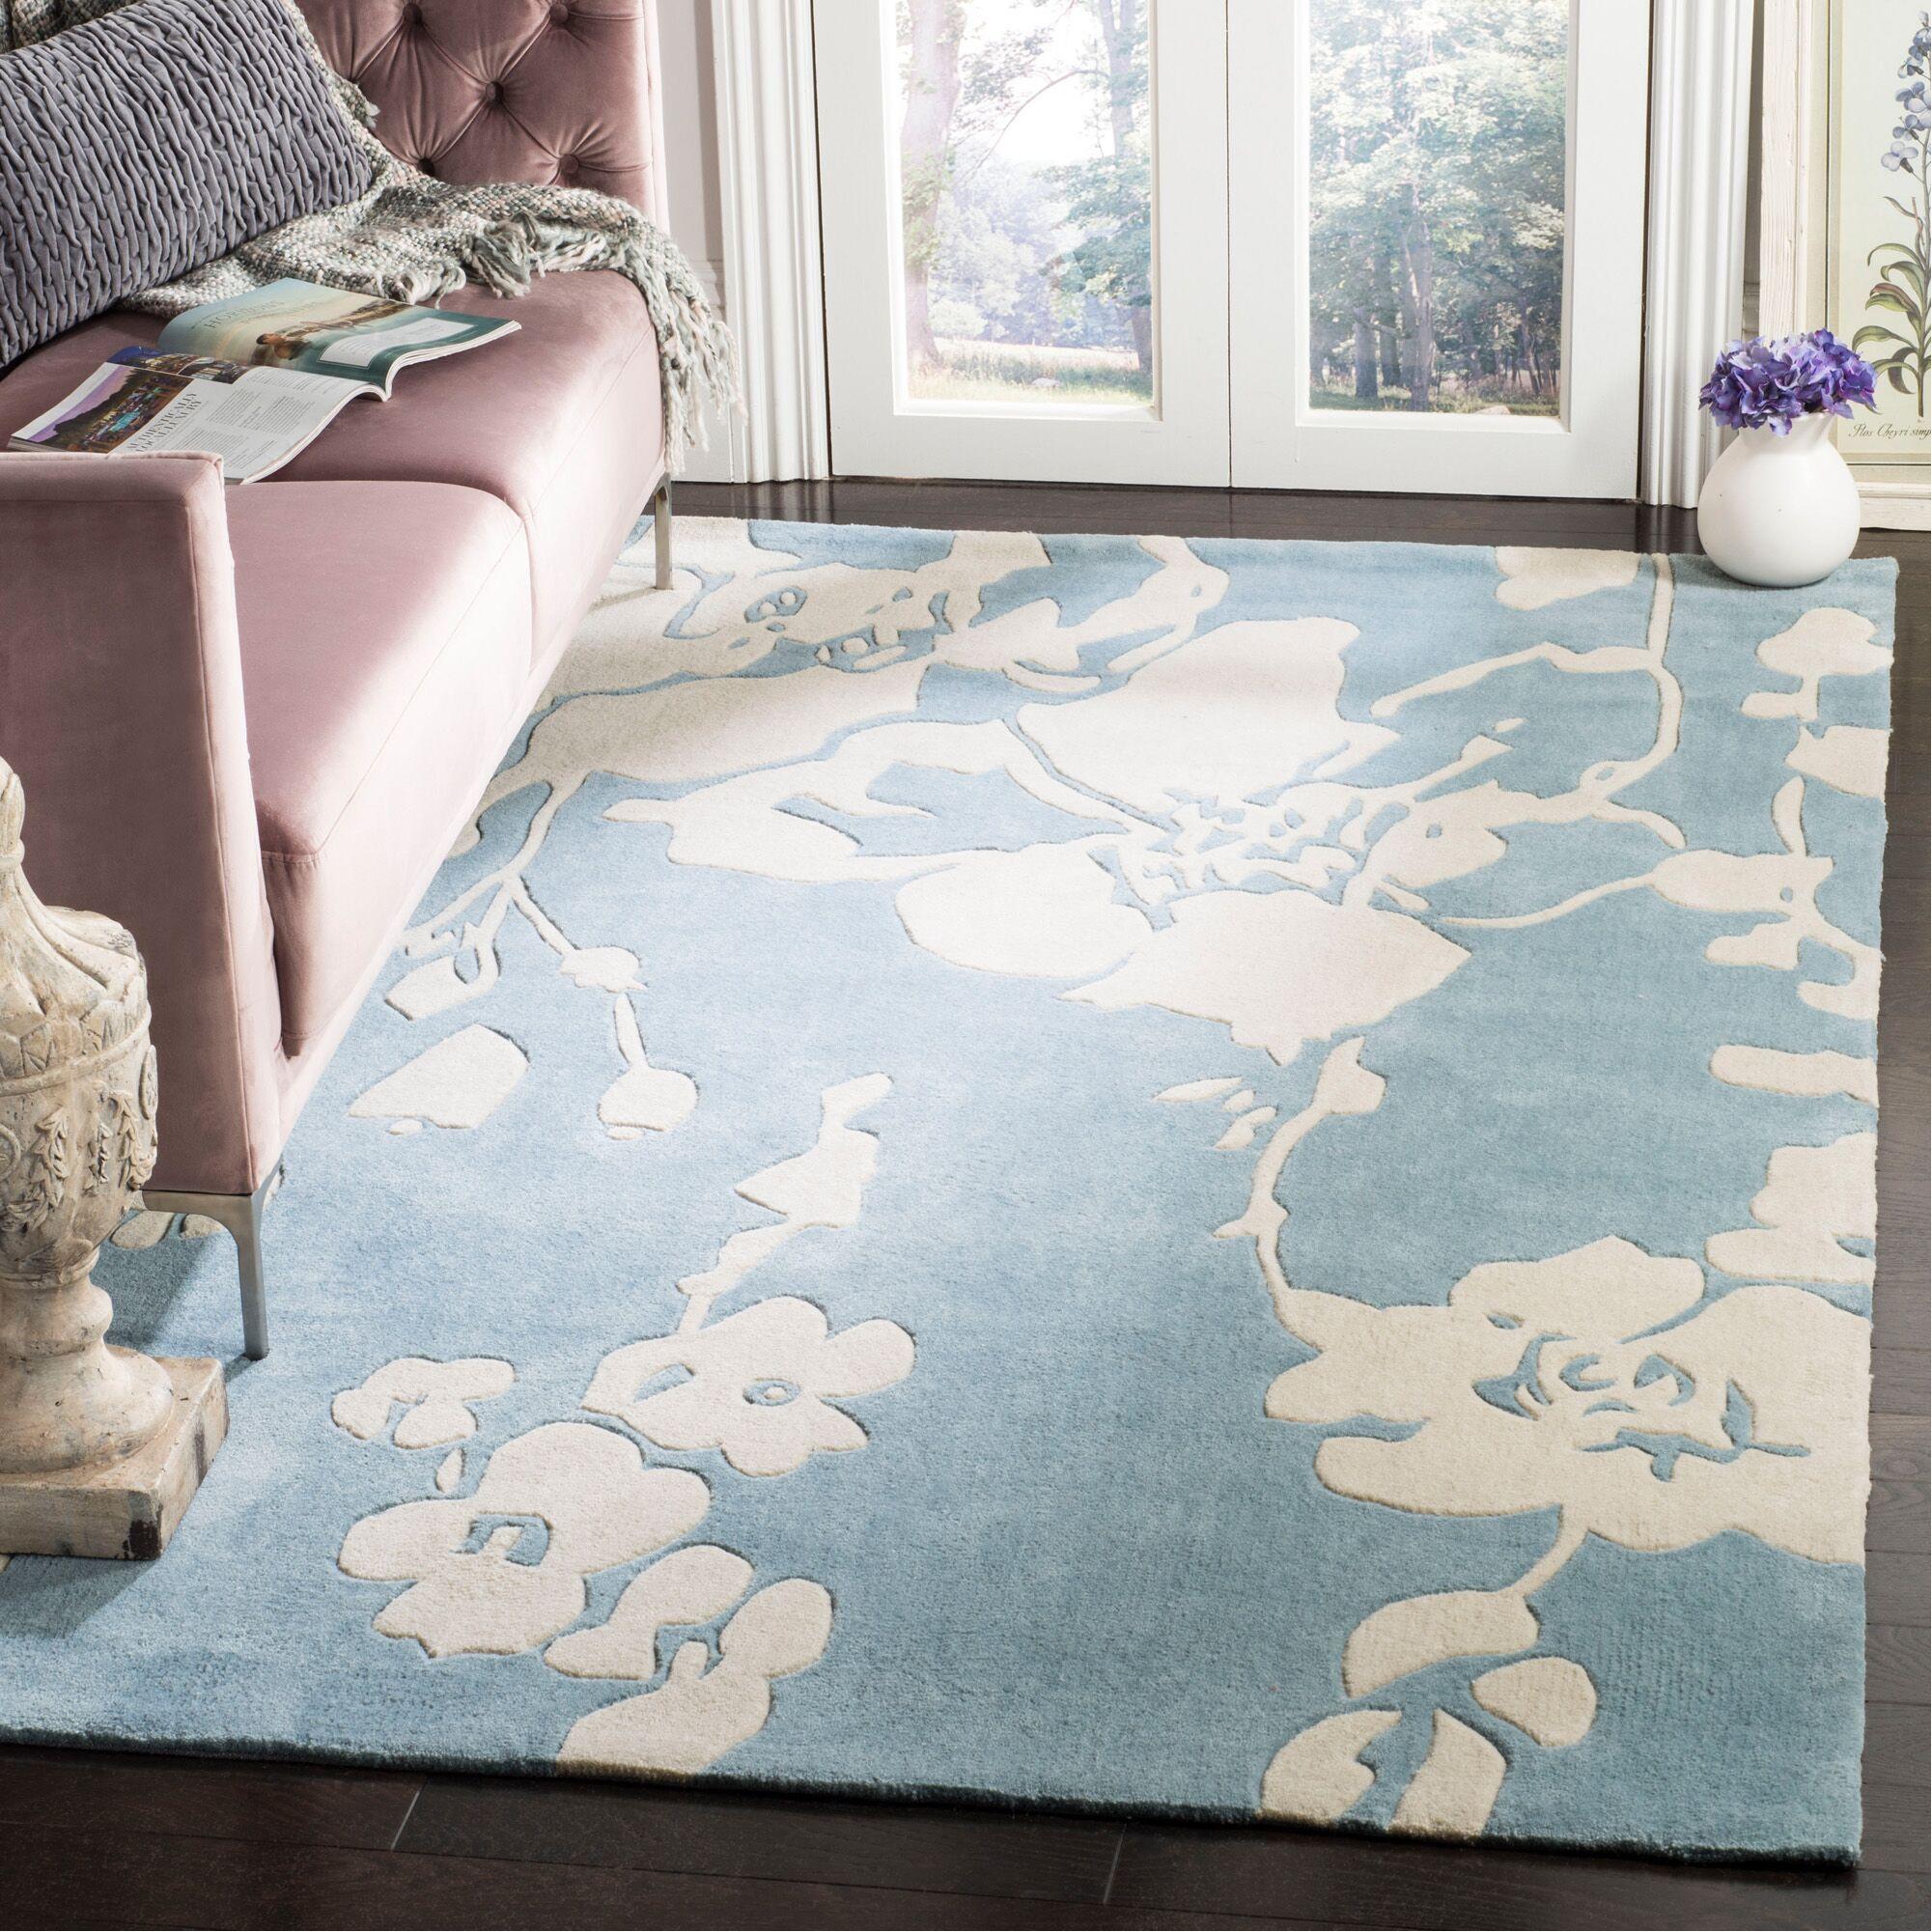 Modern Art Blue/Ivory Rug Rug Size: Rectangle 5' x 8'